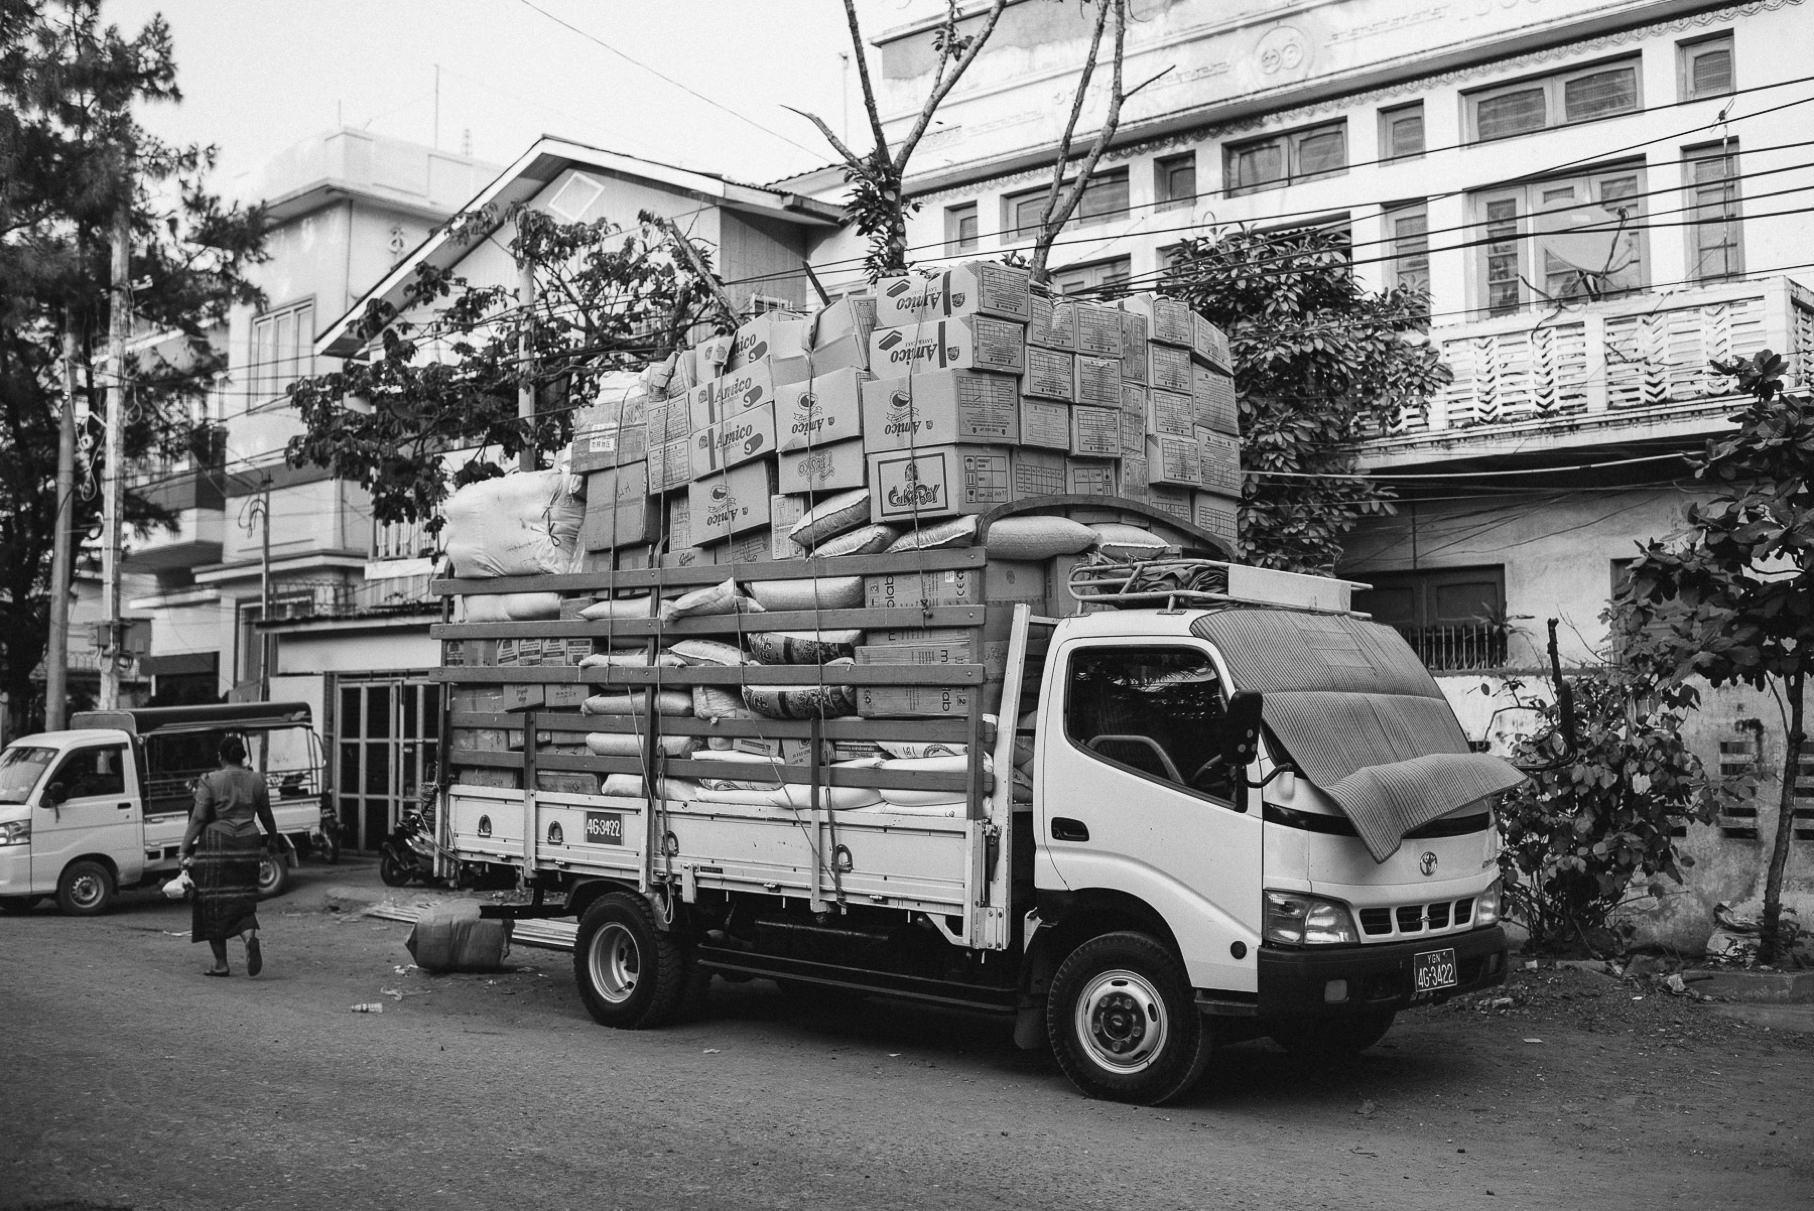 0013 yangon mandalay d76 6496 - Großstädte Myanmars - Yangon & Mandalay